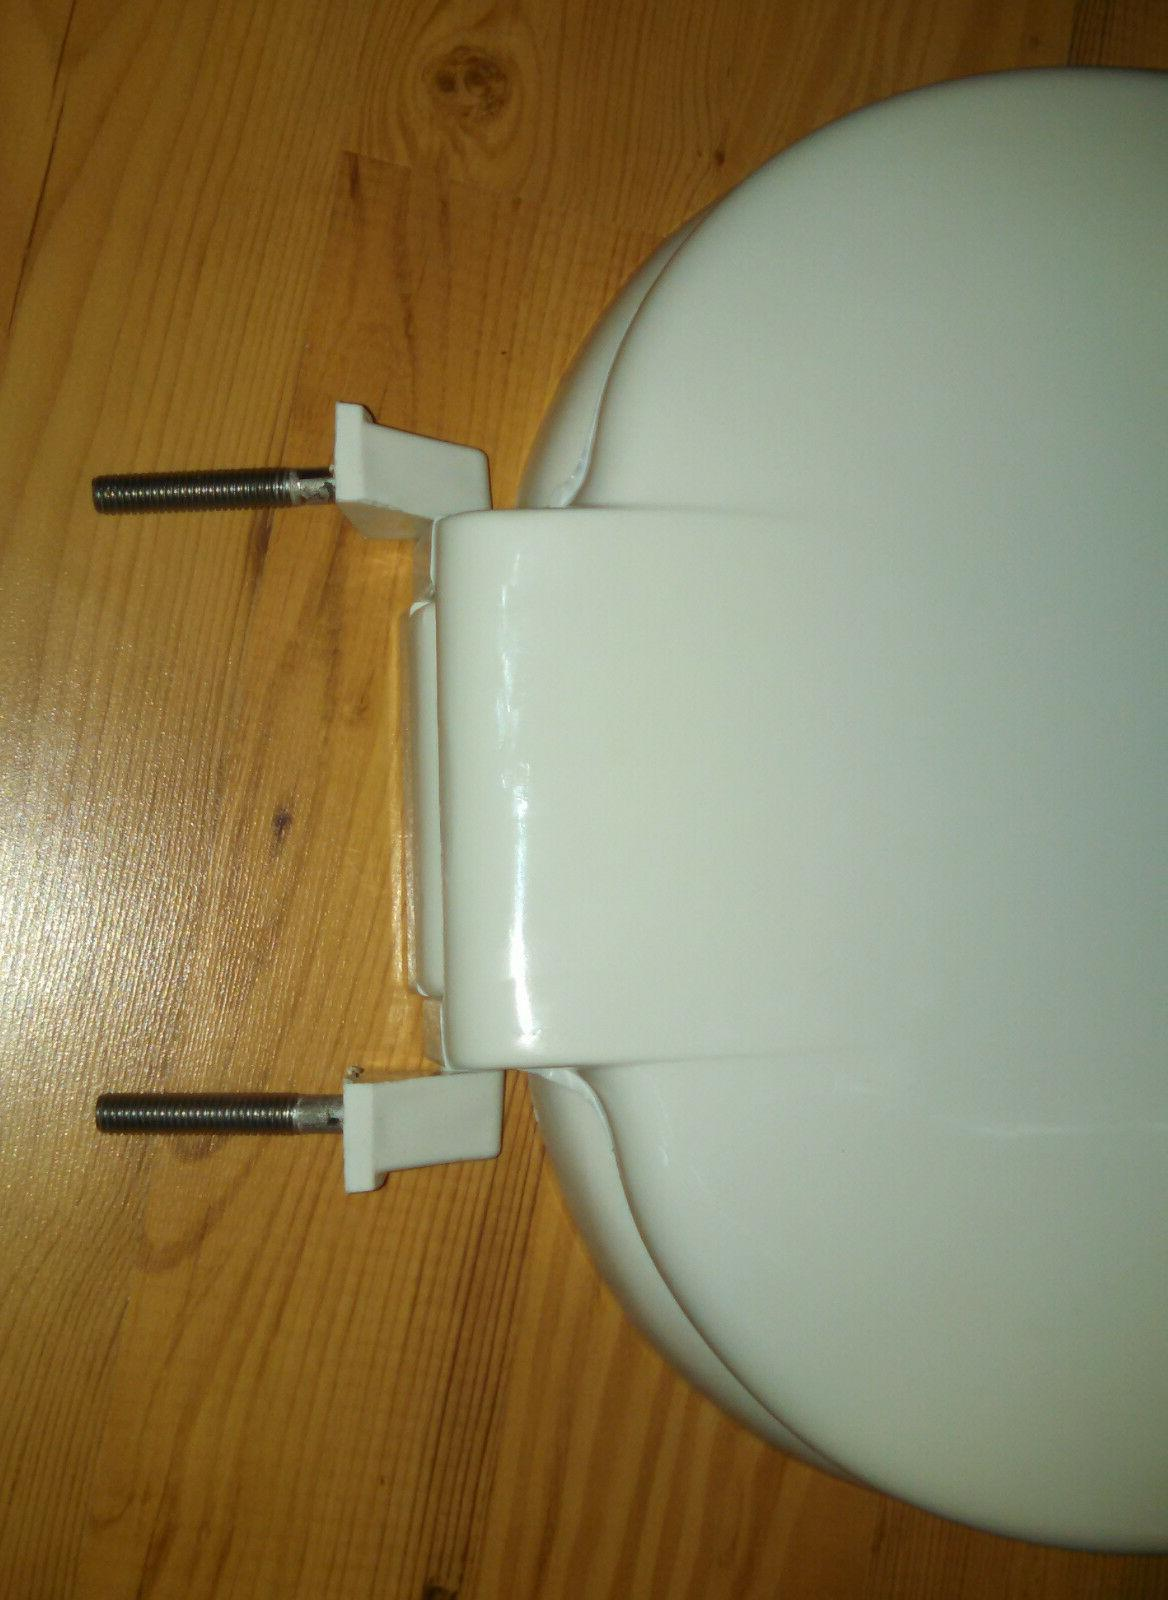 Beneke Heavy Duty Solid Plastic Round Seat 420 H - White